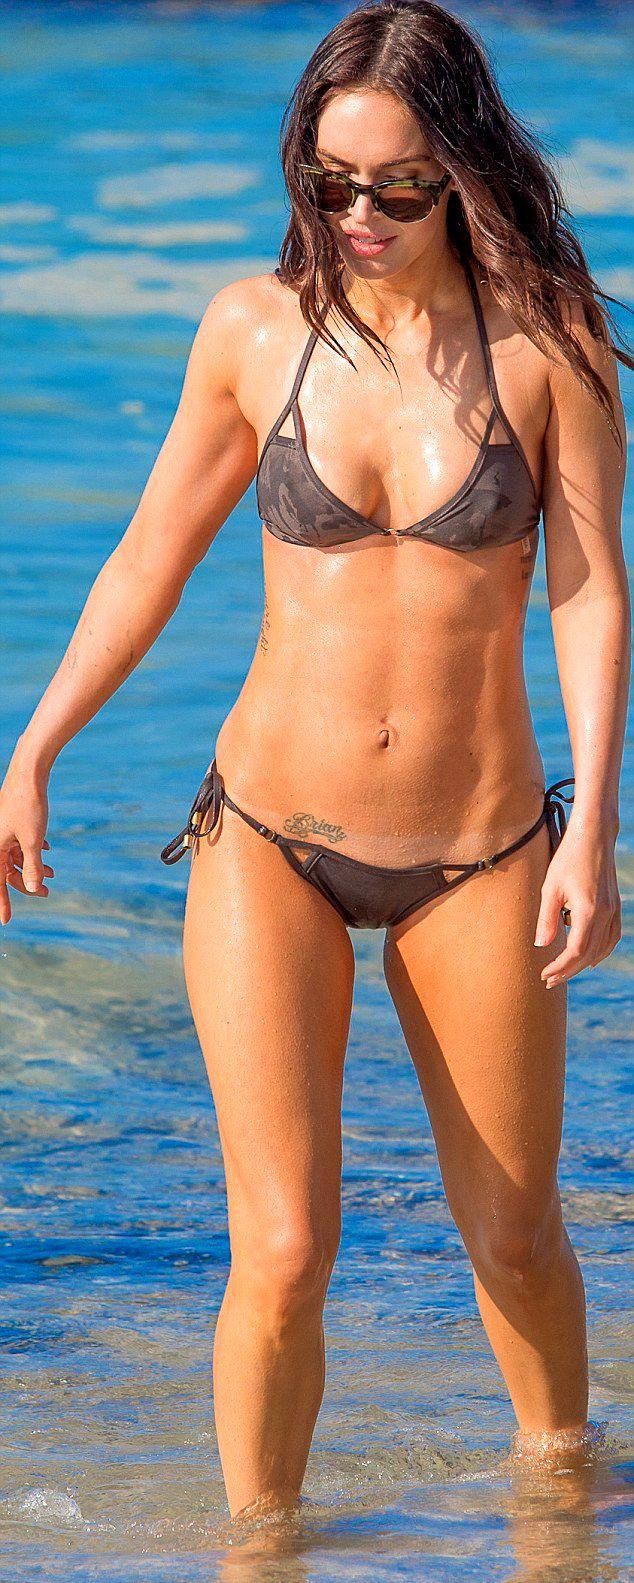 Megan cauble bikini